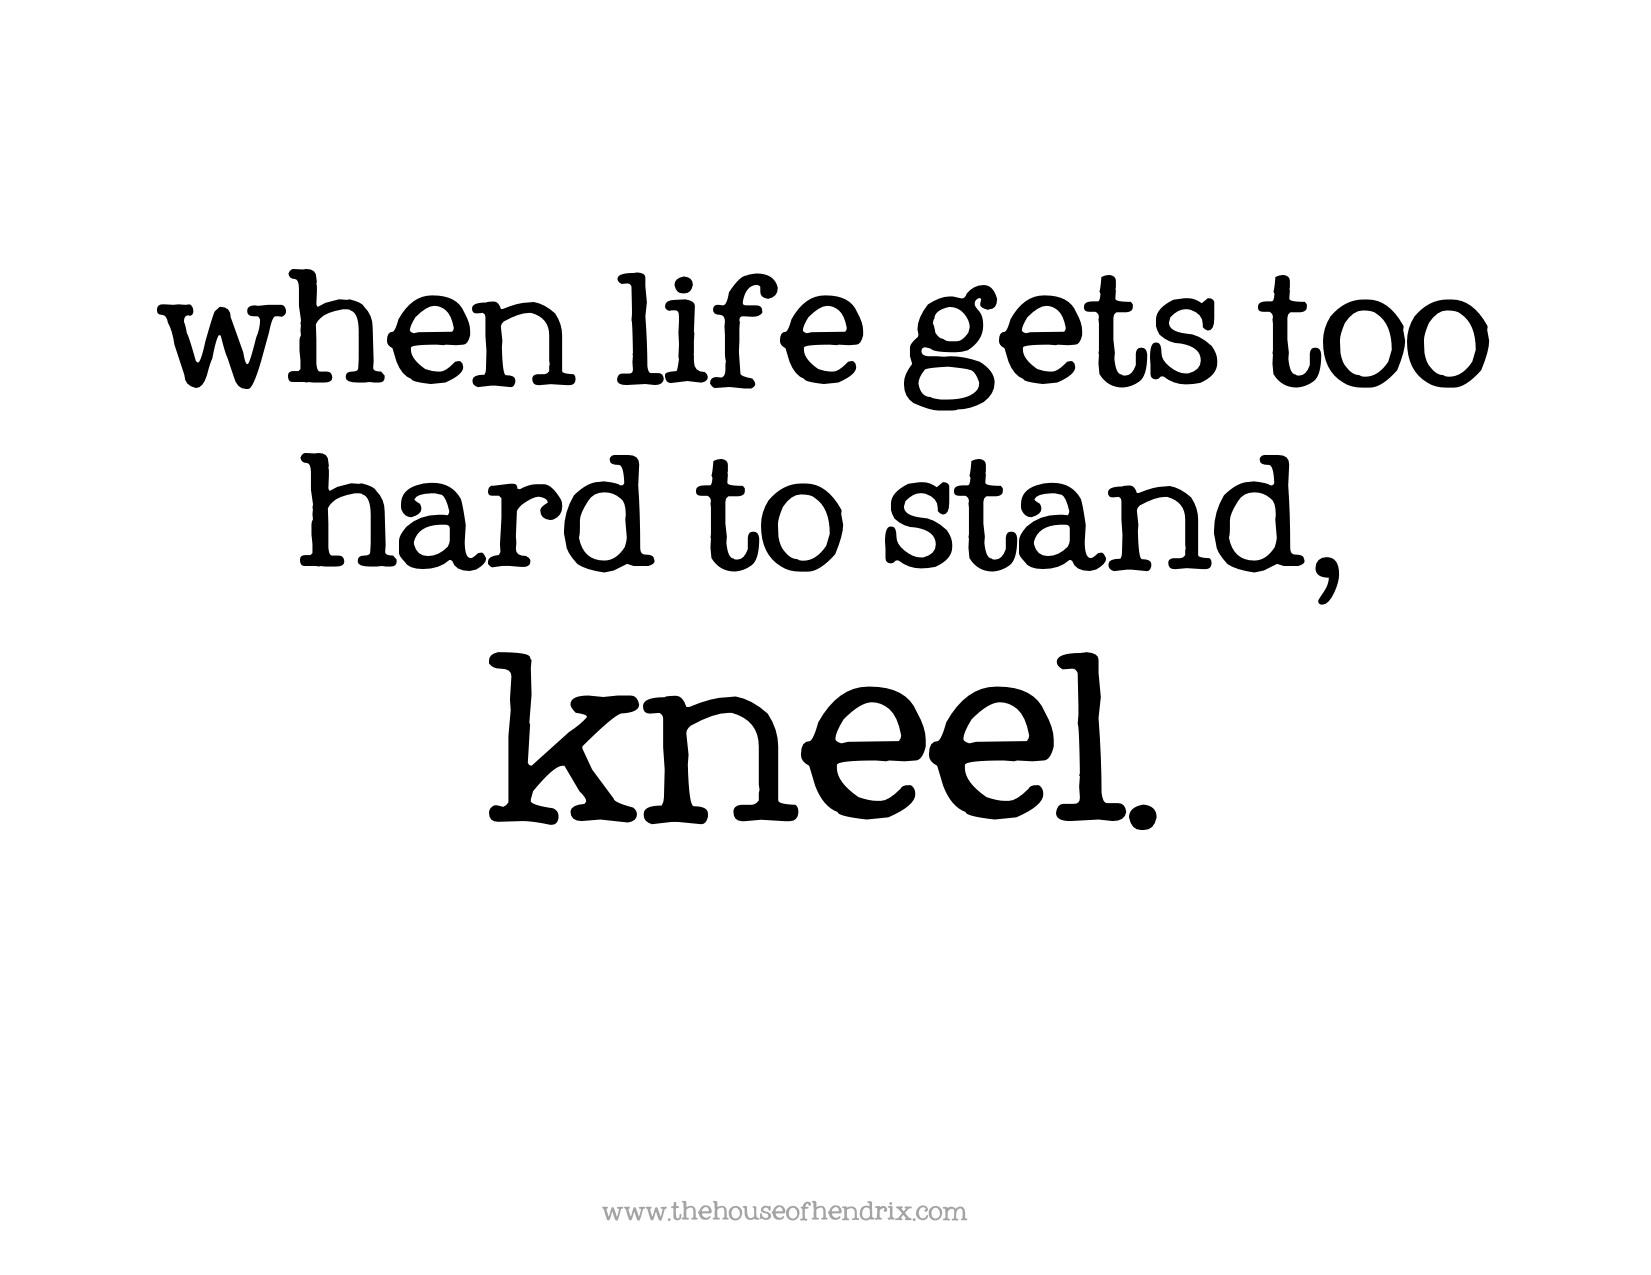 As I Kneel